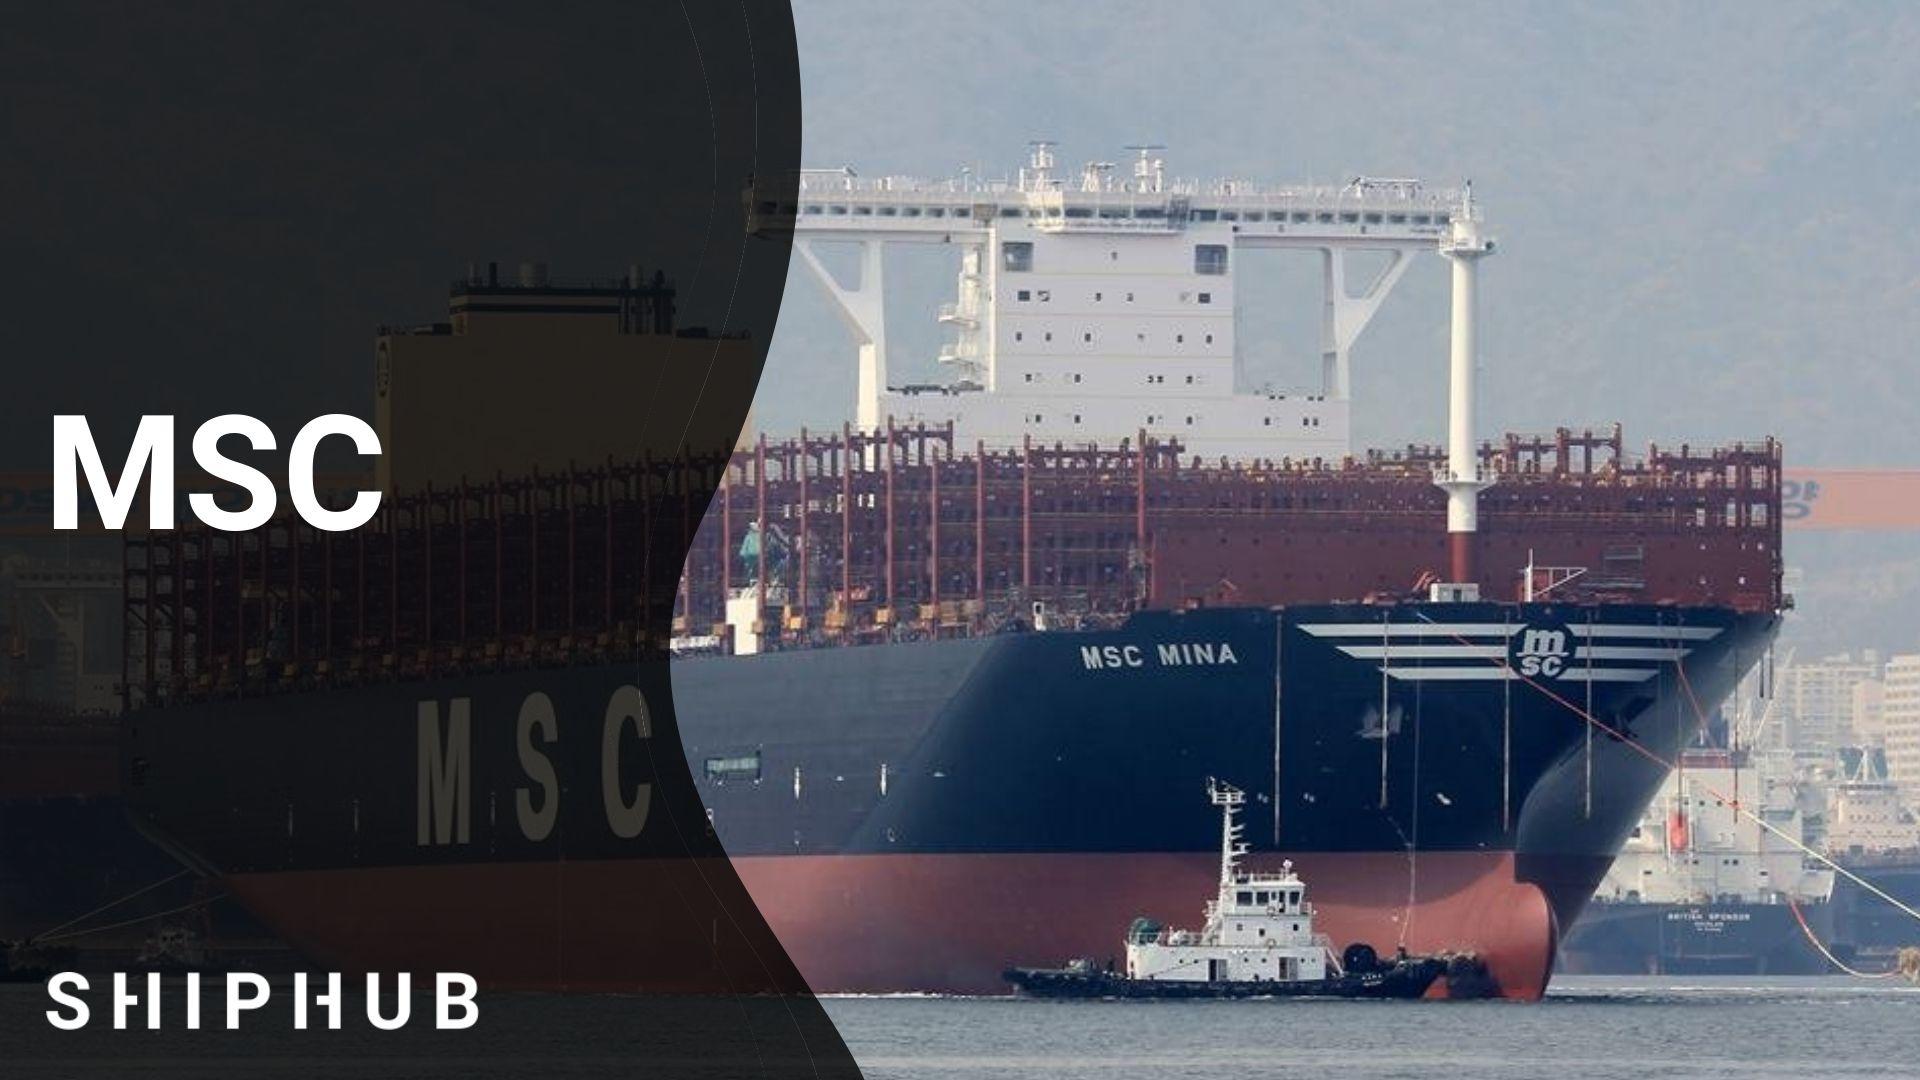 msc shipowner